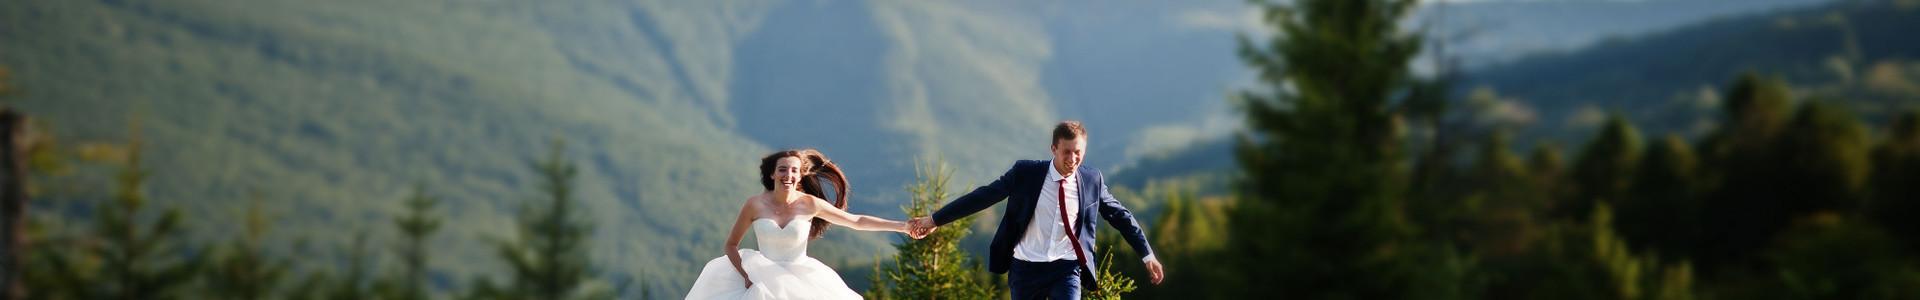 All Inclusive wedding package in Branson MO | Westgate Weddings at Westgate Branson Woods Resort